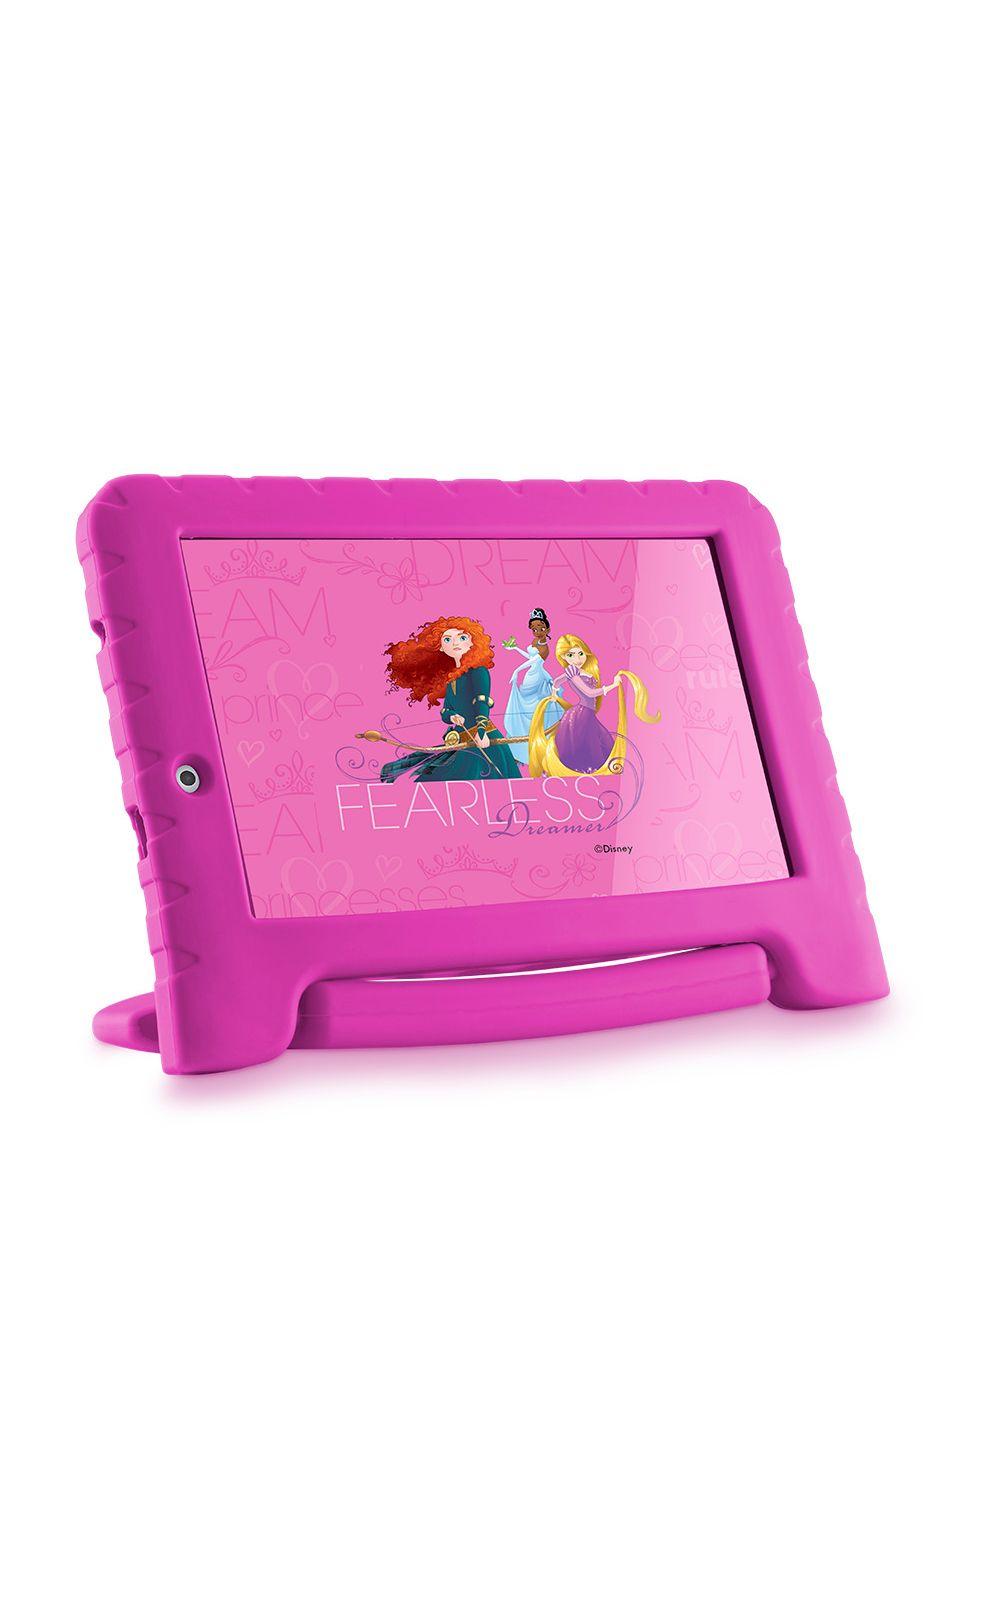 Foto 4 - Tablet Multilaser Disney Princesas Plus 16GB Tela 7 Pol. Quad Core Dual Câmera Rosa- NB308